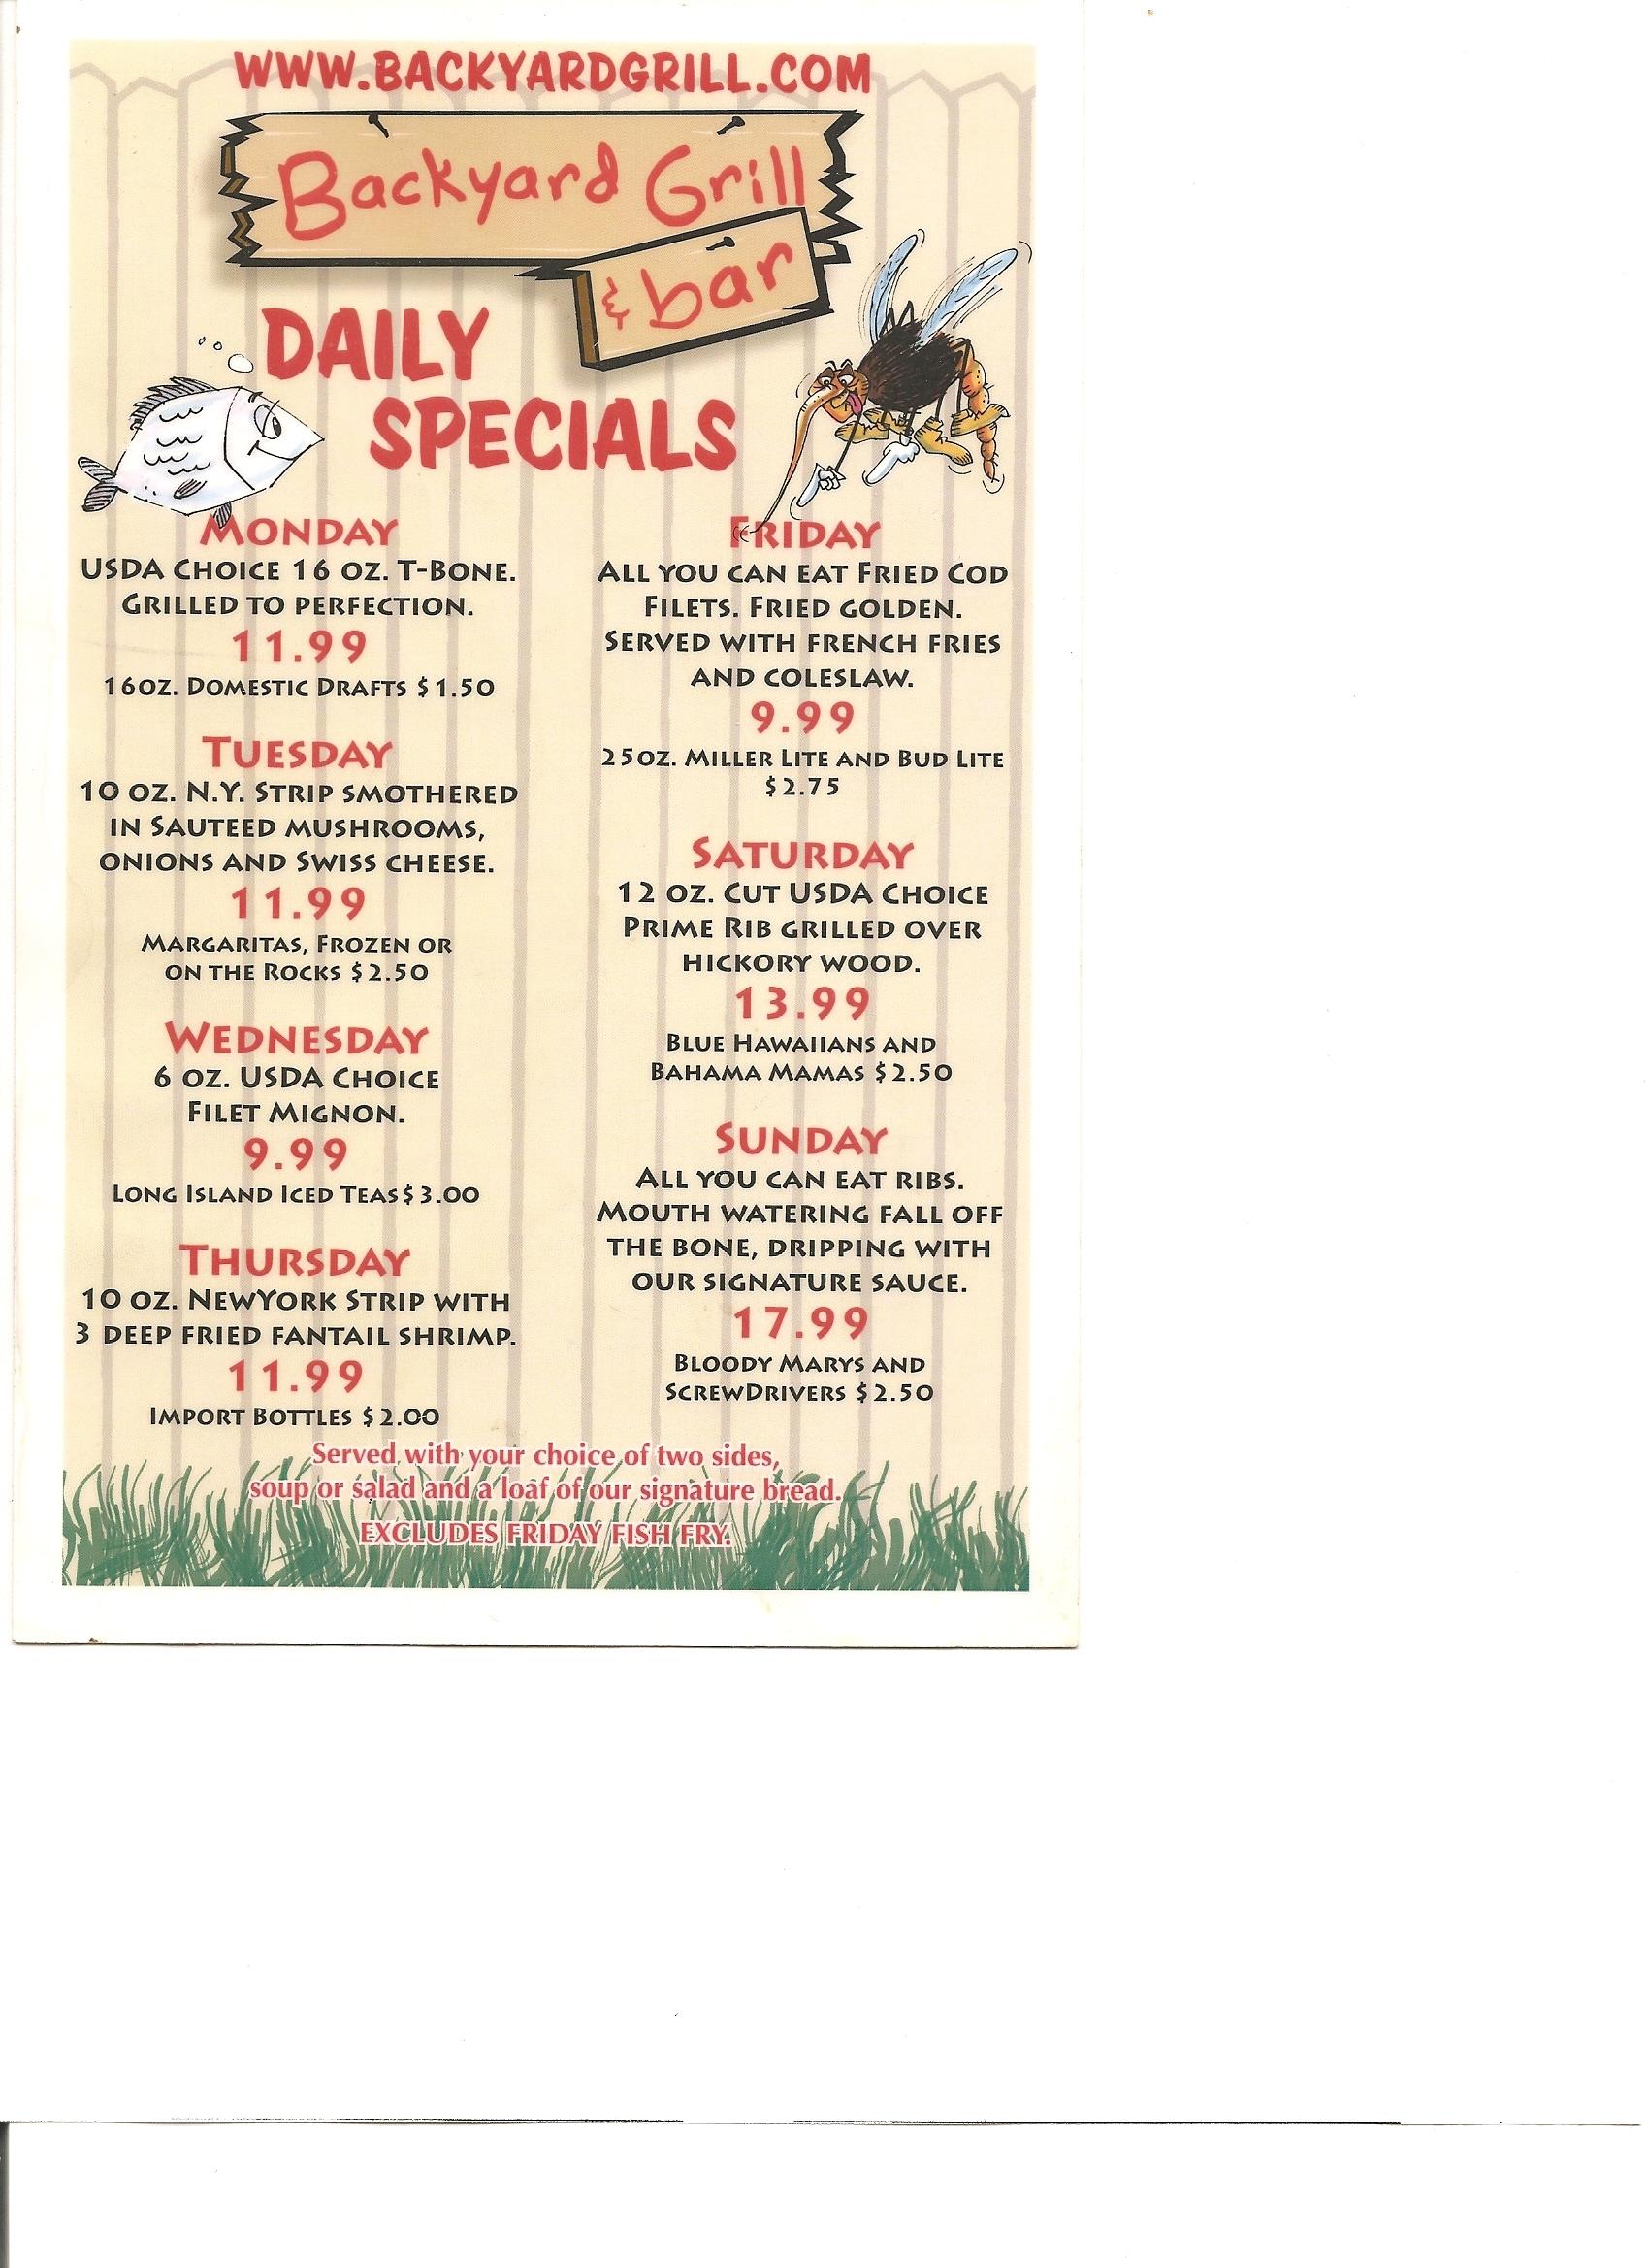 Backyard Grill and Bar Daily Specials Menu | Backyard ...